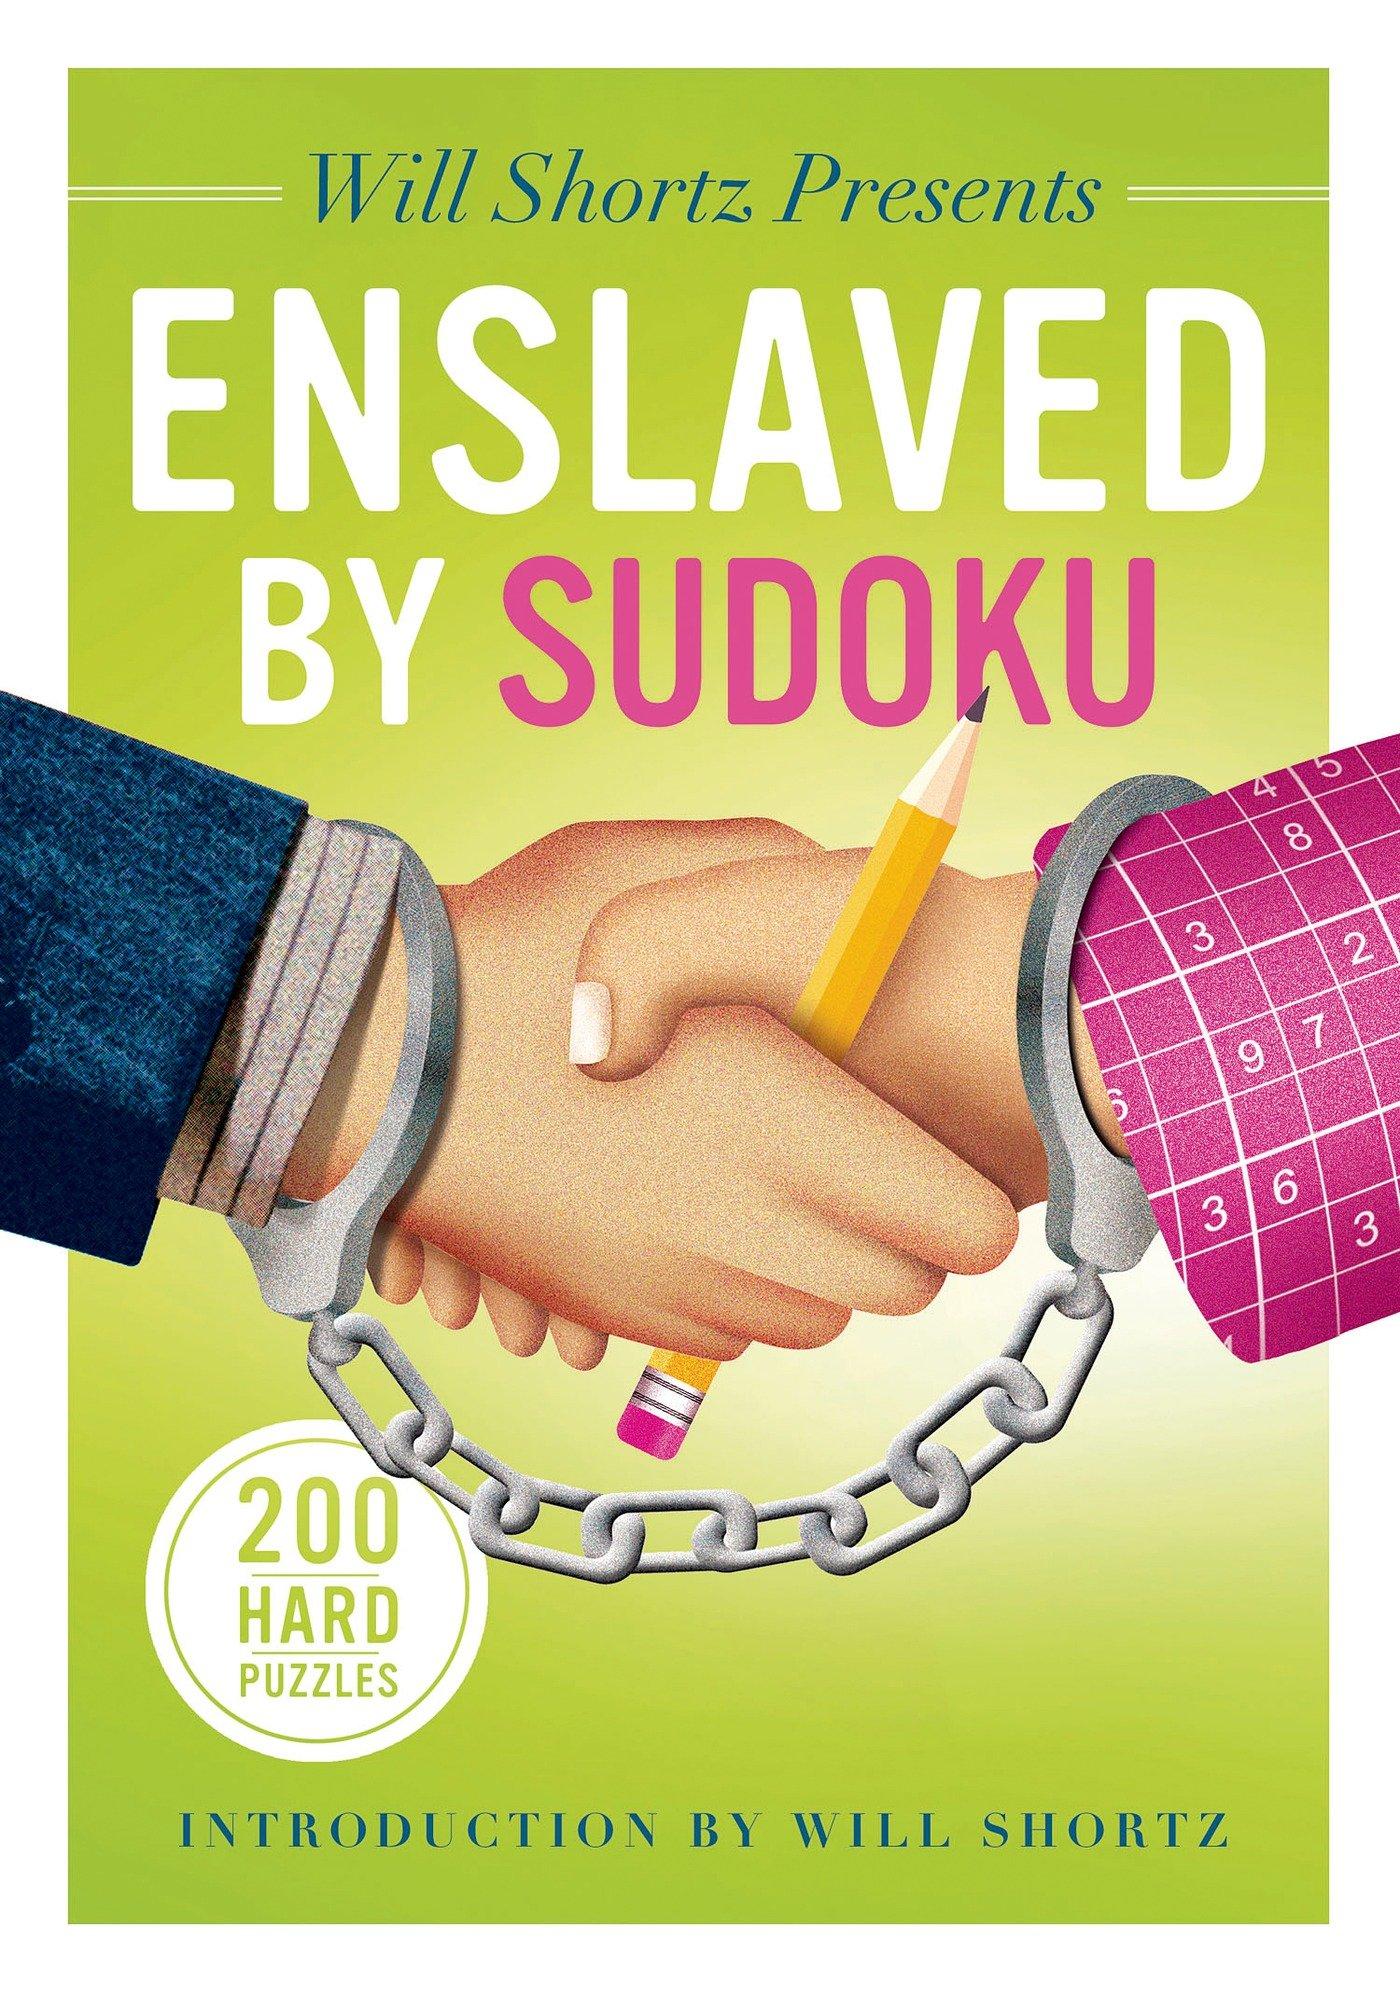 Will Shortz Presents Enslaved by Sudoku: 200 Hard Puzzles: Will Shortz:  9781250044976: Amazon.com: Books